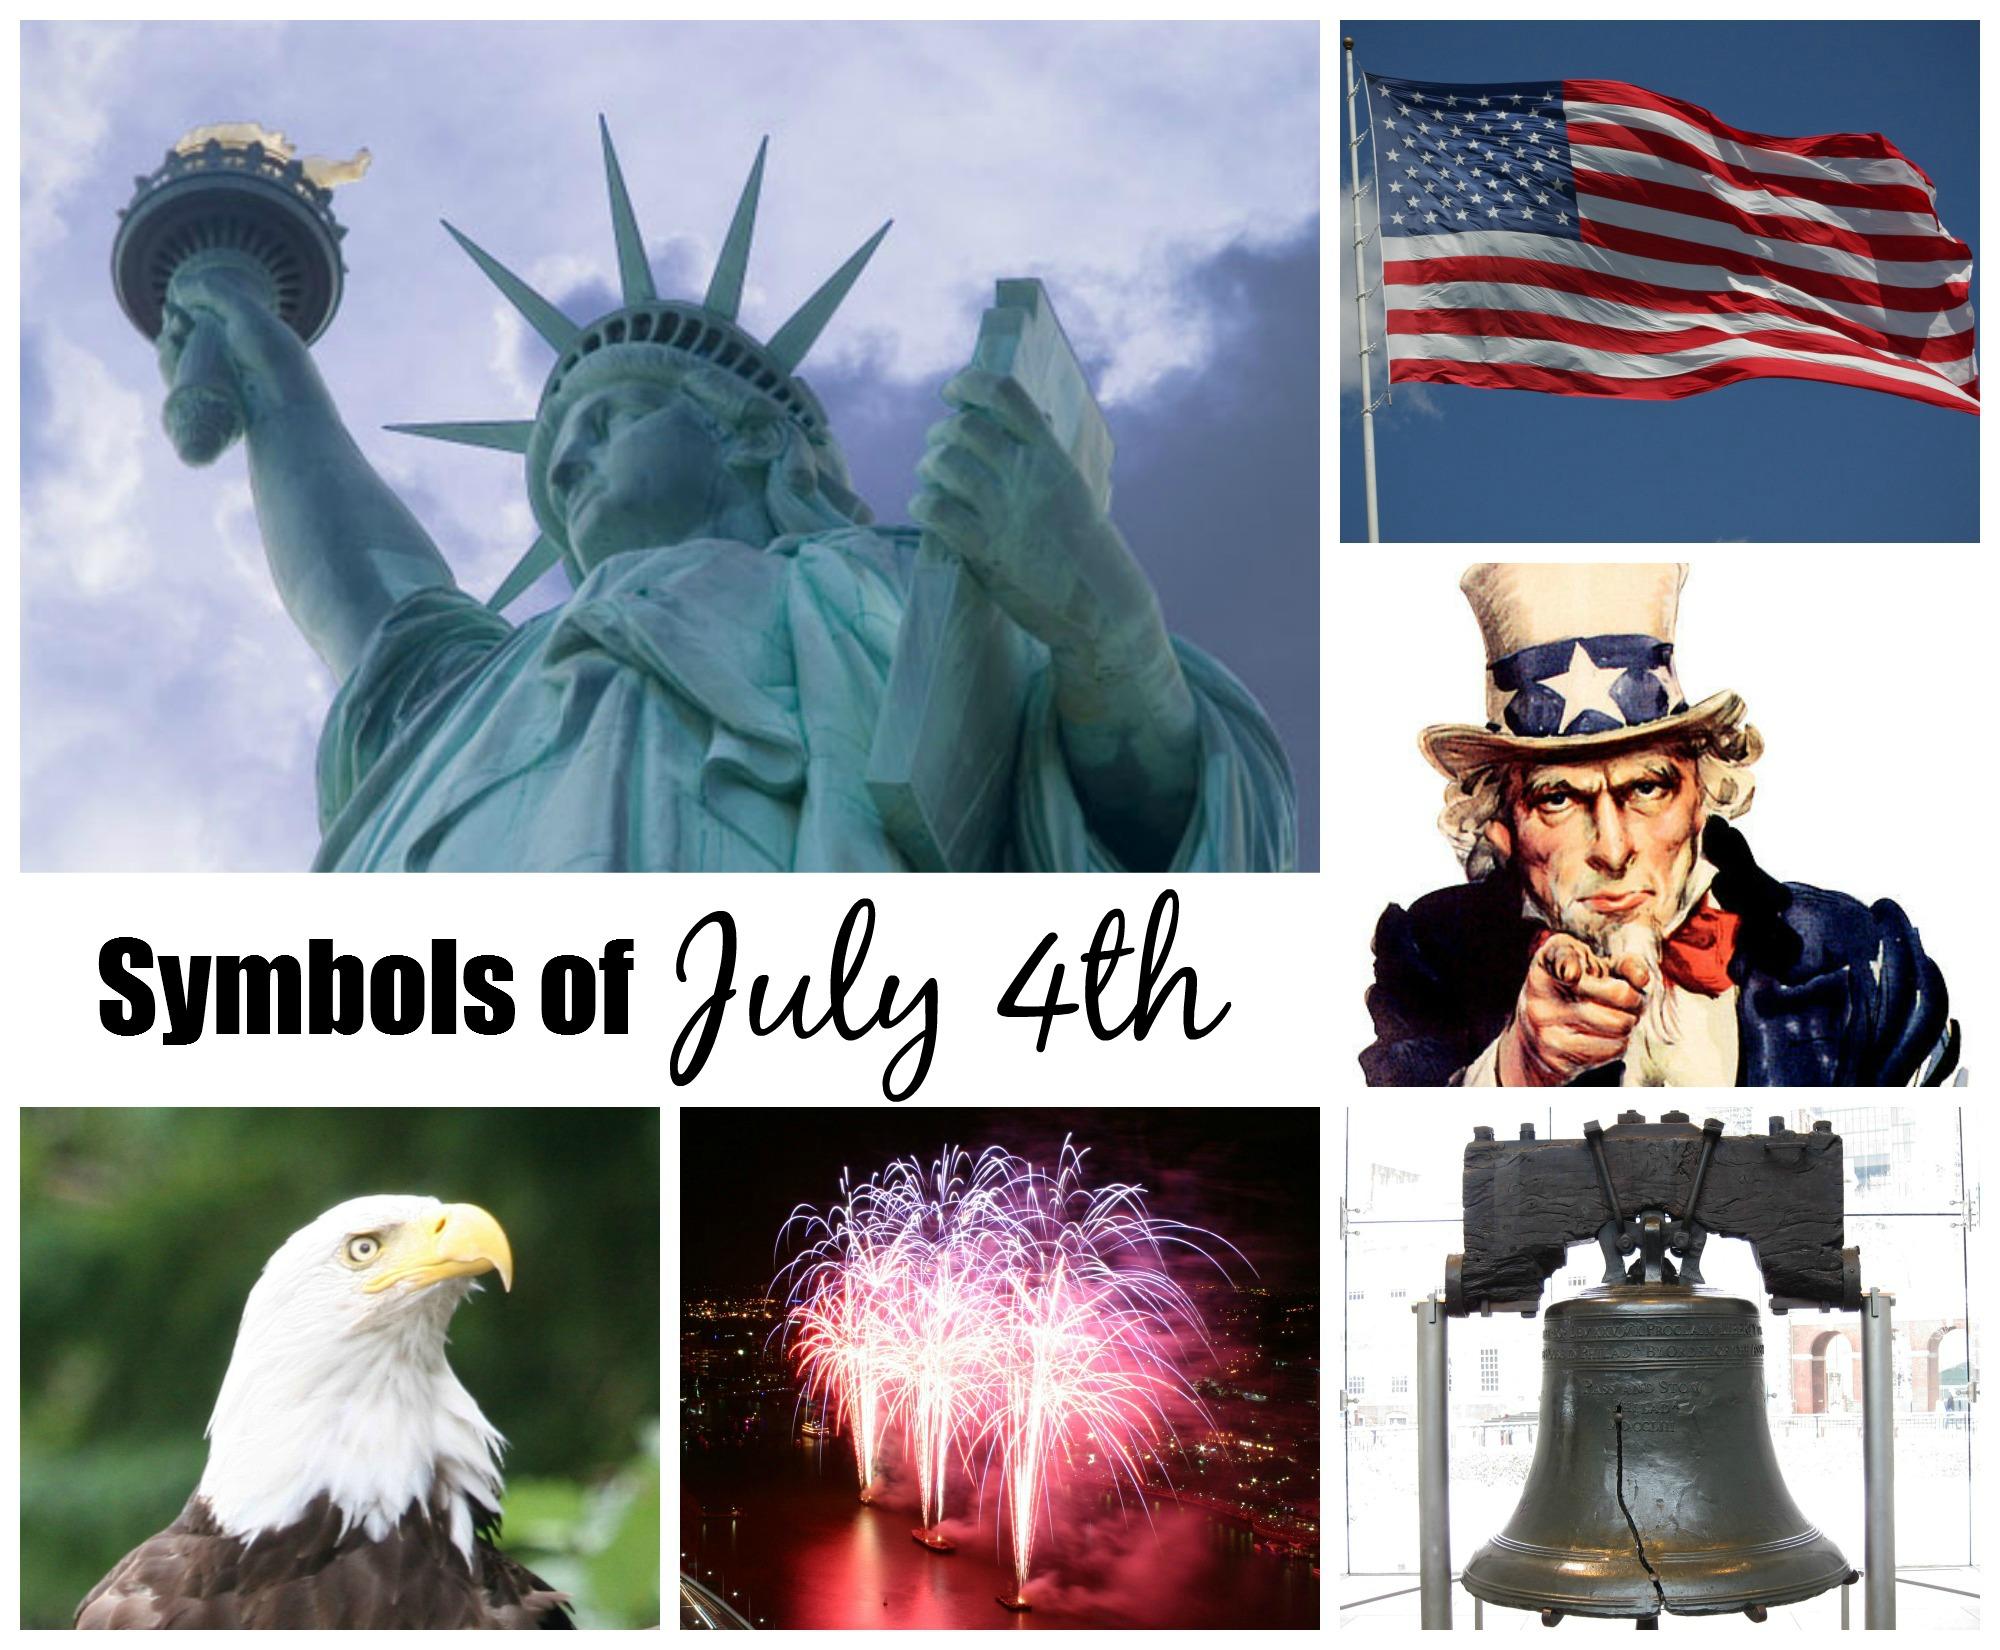 July 4th And Patriotic Symbols